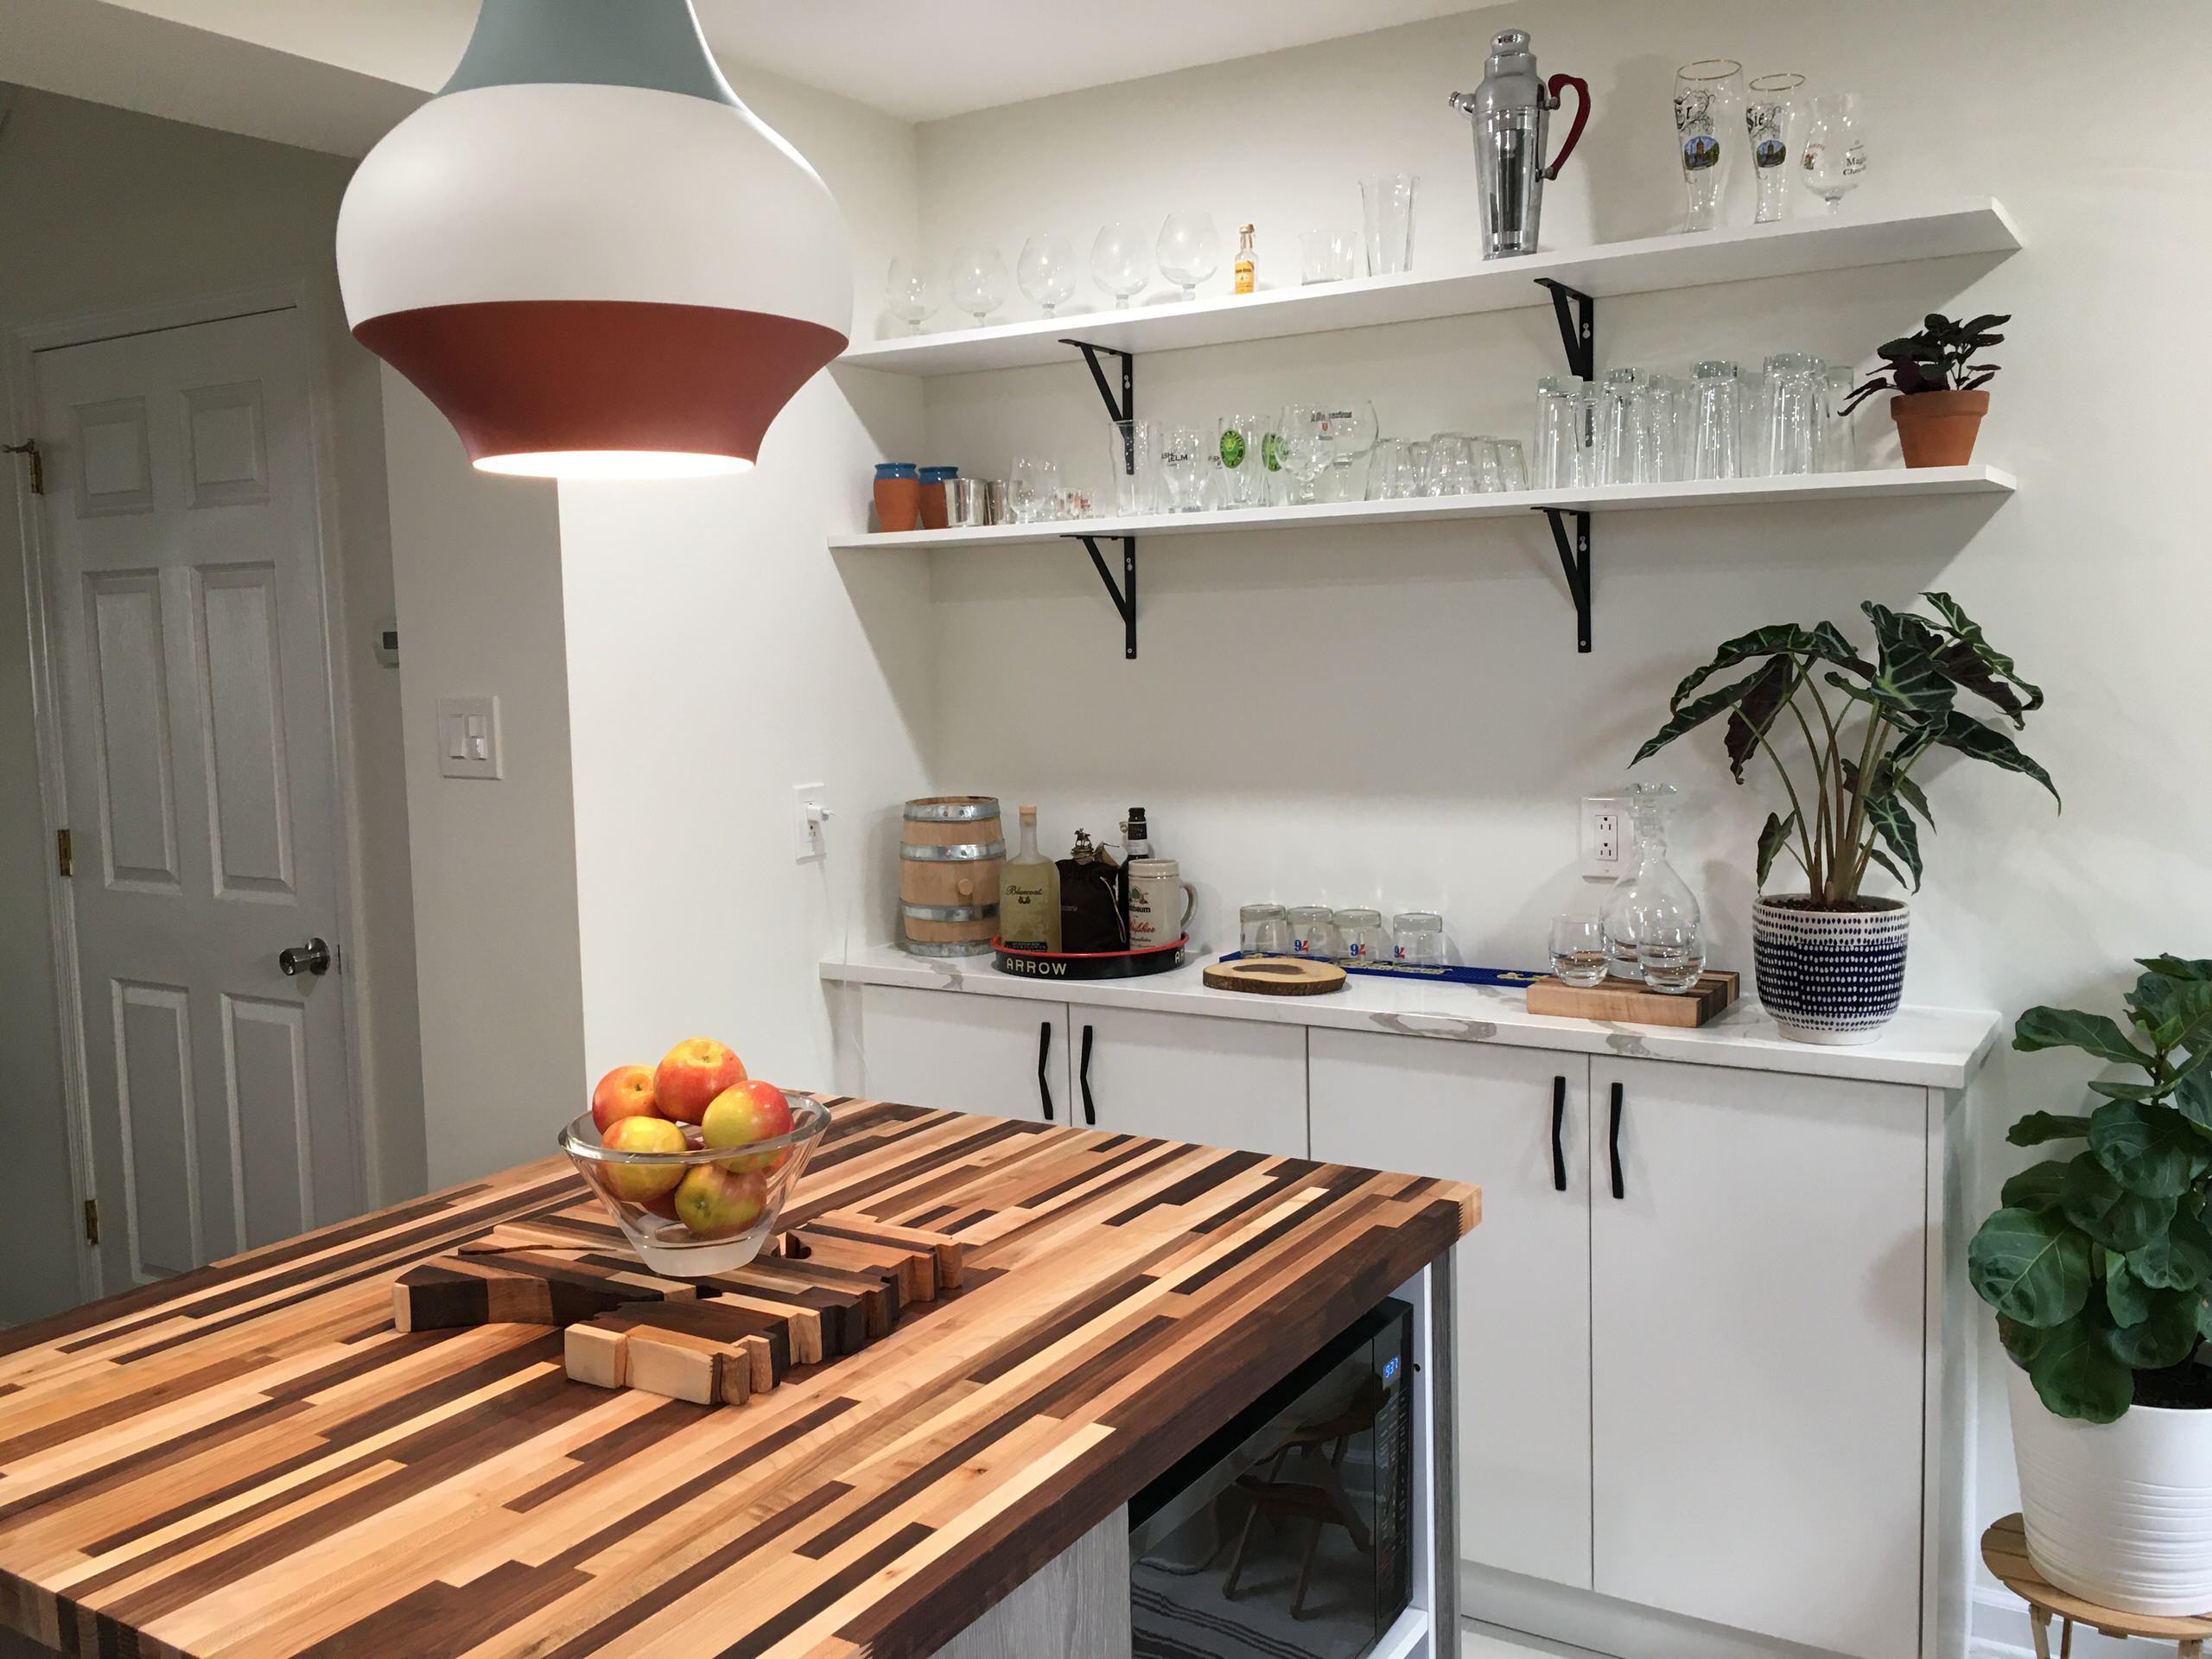 Philadelphia - Row home transformation